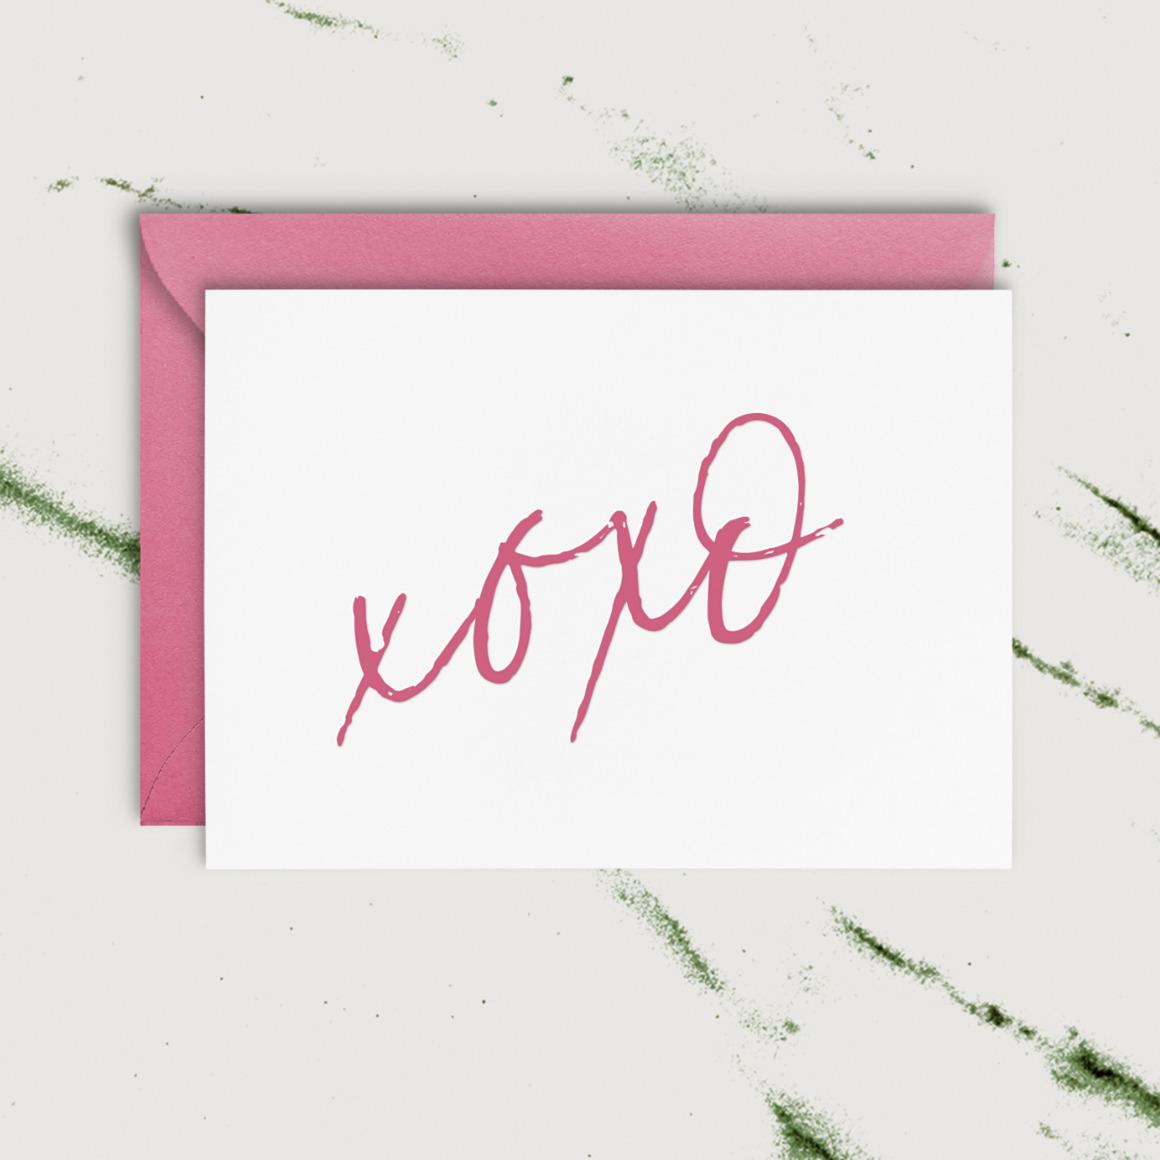 xoxo   Letterpress Greeting Card   Trada Marketplace